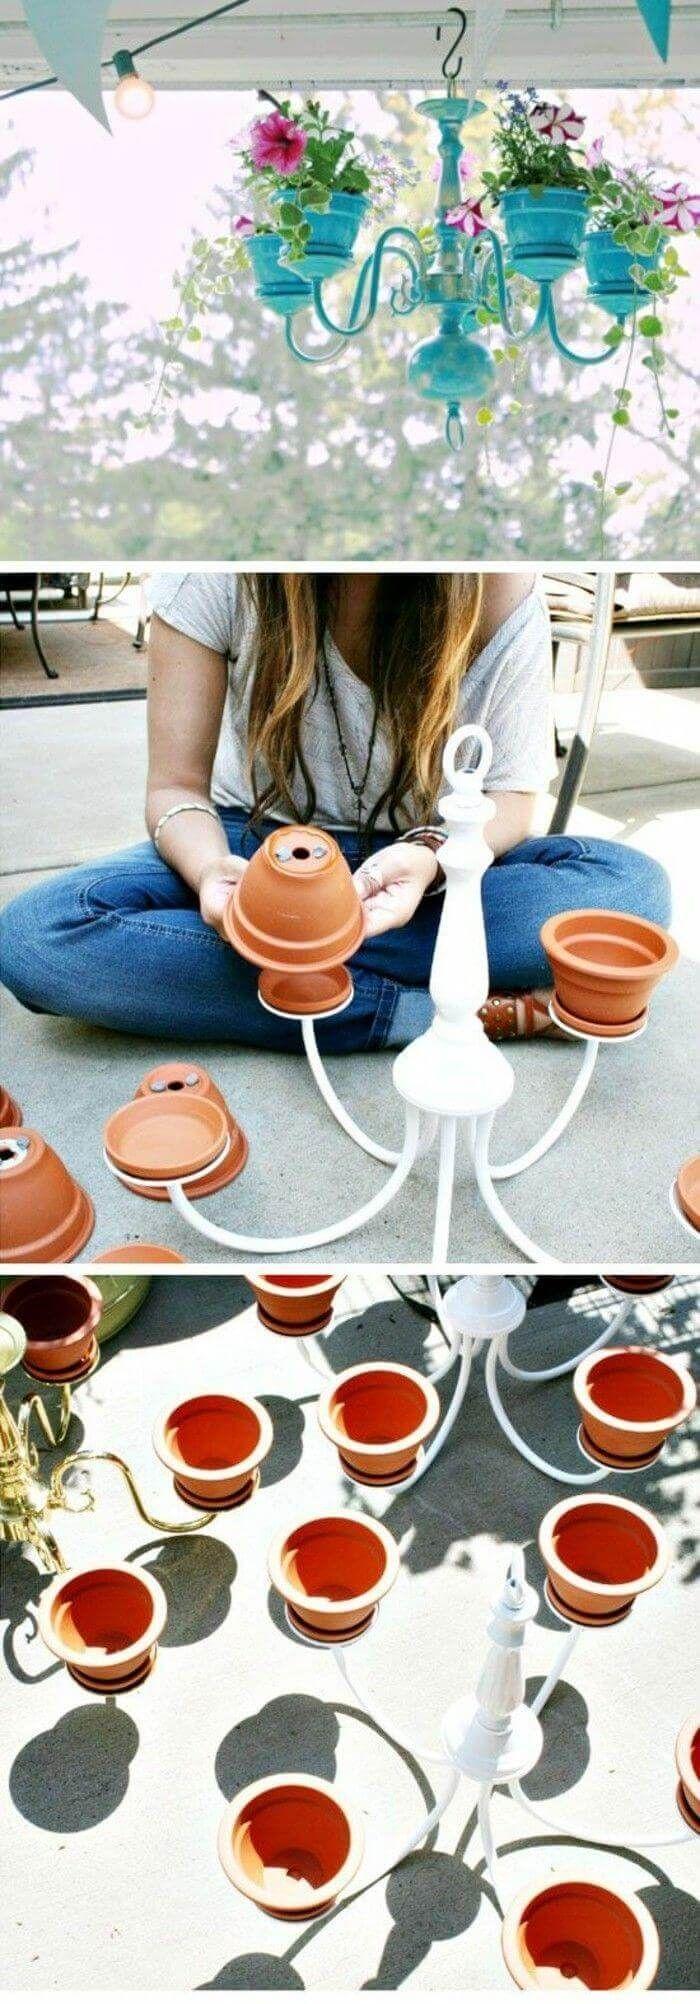 Playful DIY Outdoor Hanging Planter Ideas